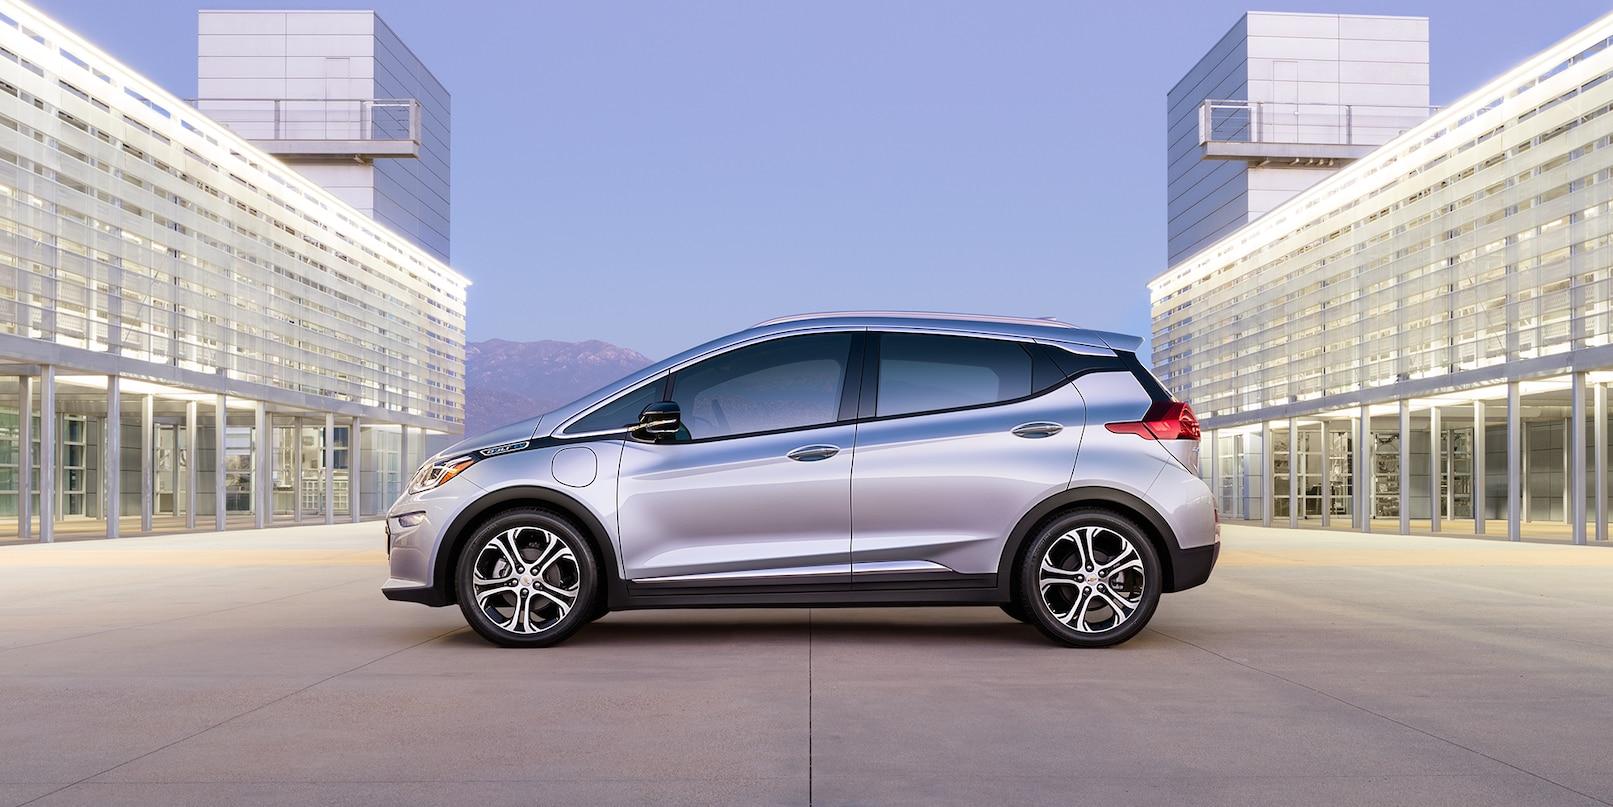 2018 Chevrolet Bolt EV for Sale in Elk Grove, CA